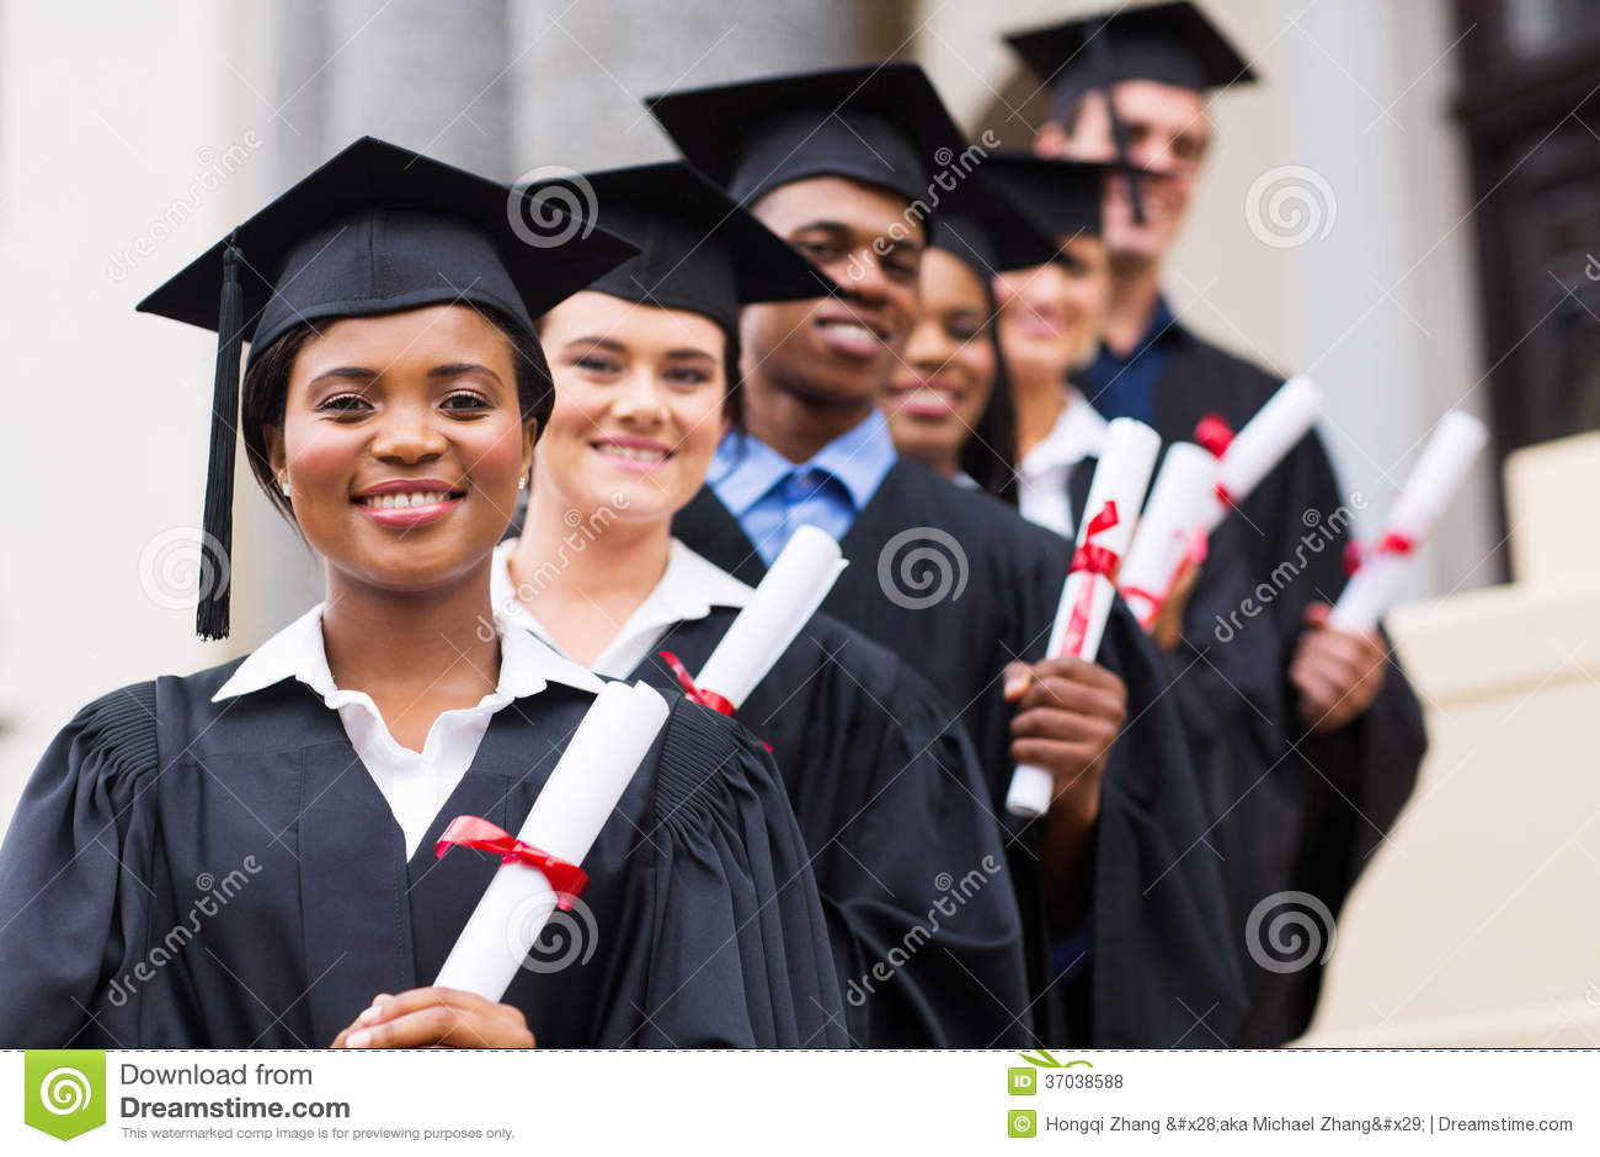 Universität graduiert Staffelung